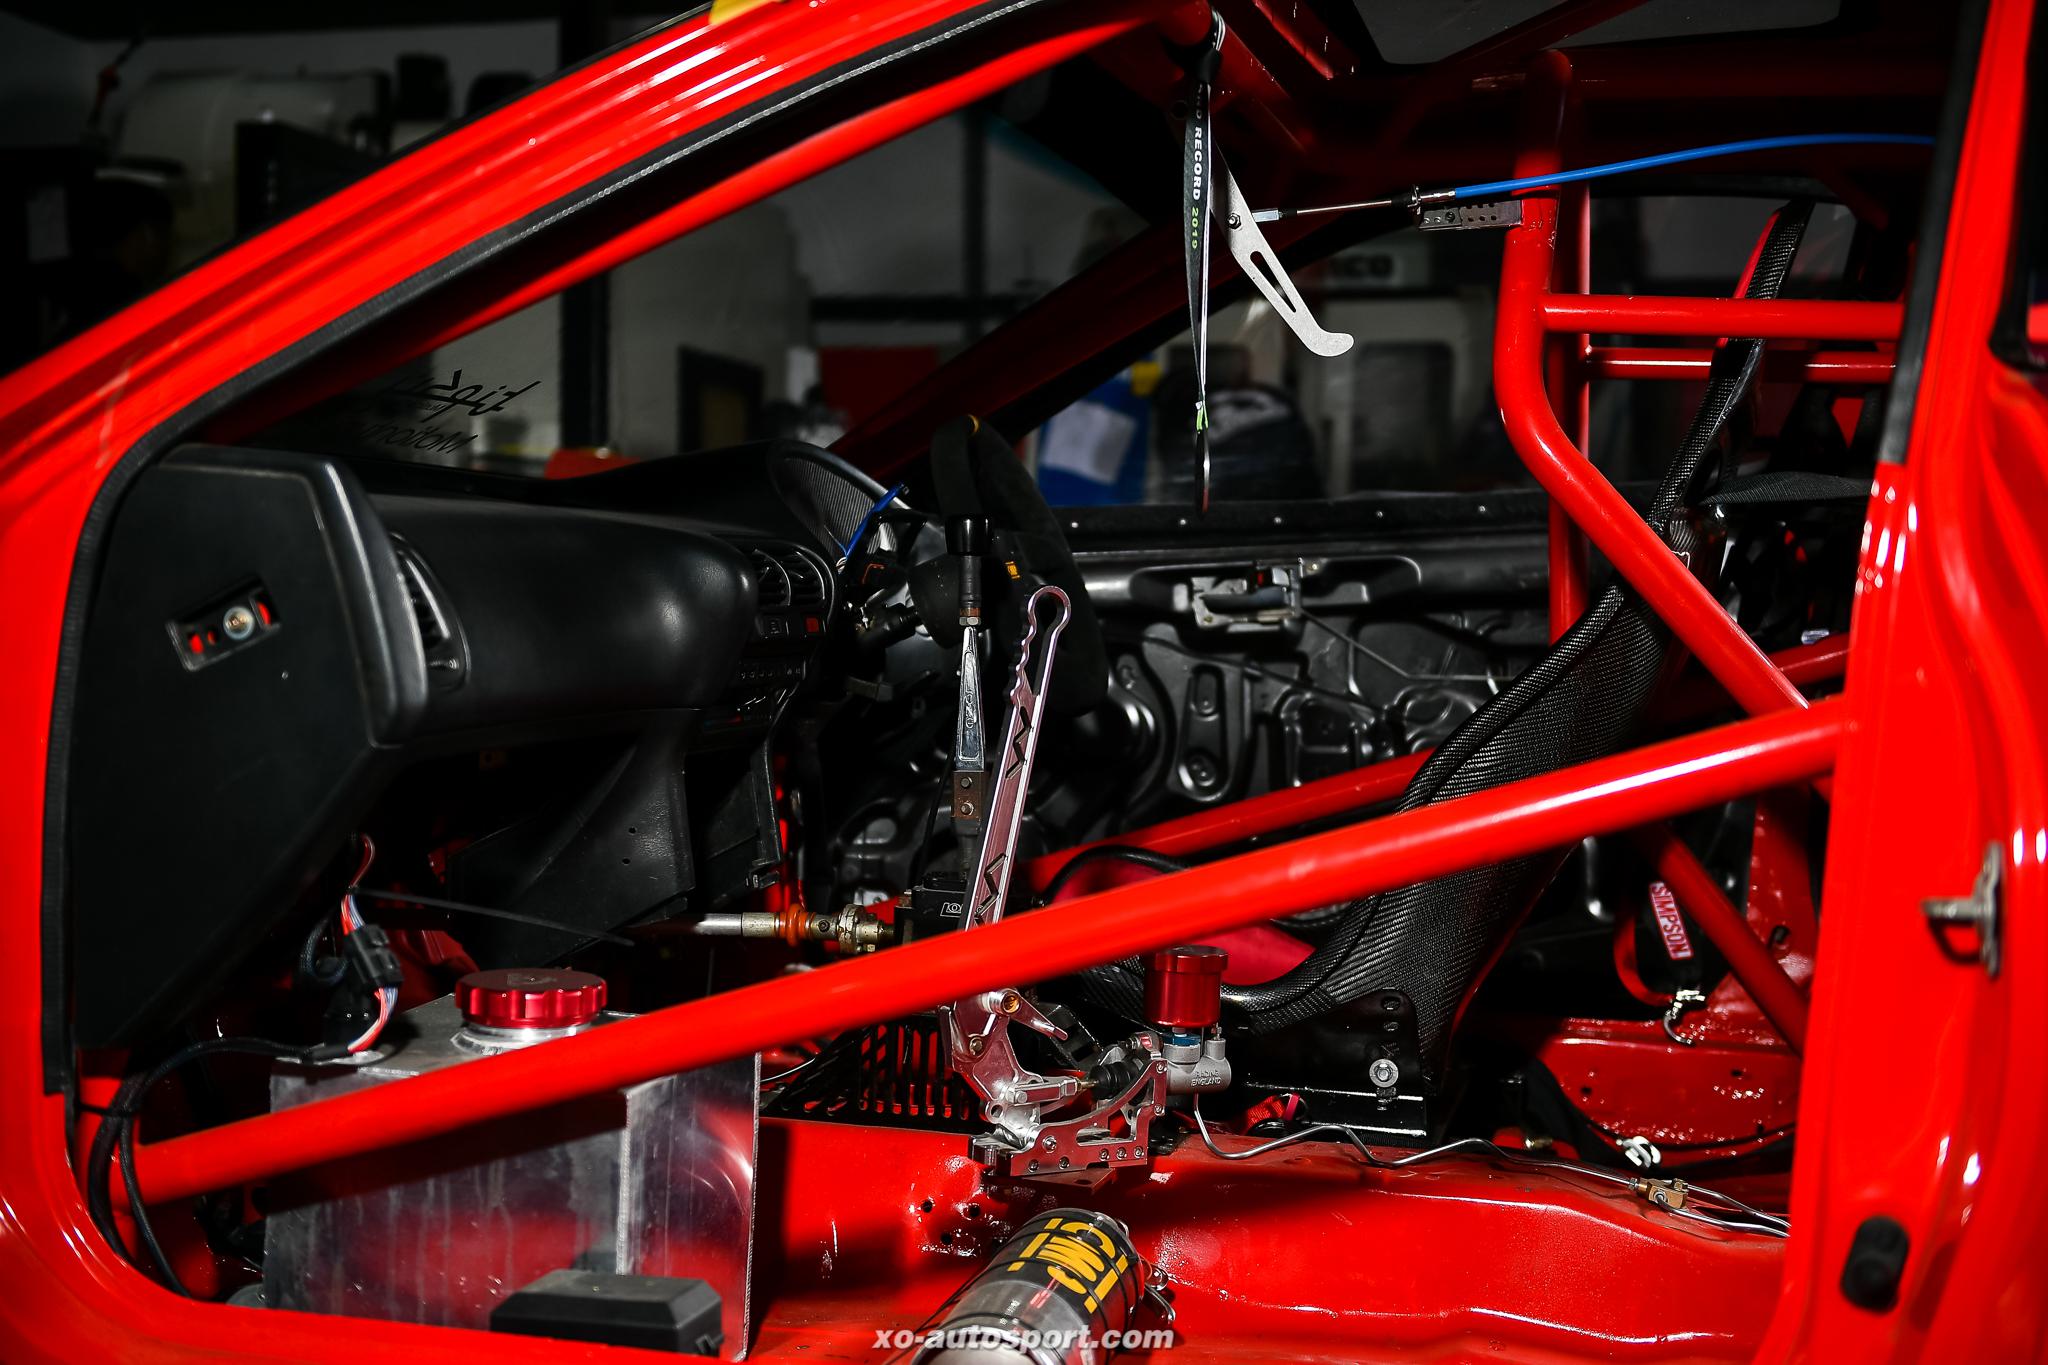 INTEGRA DC2 PRO 4 FWD Champion by FLOW LAB CNC 14